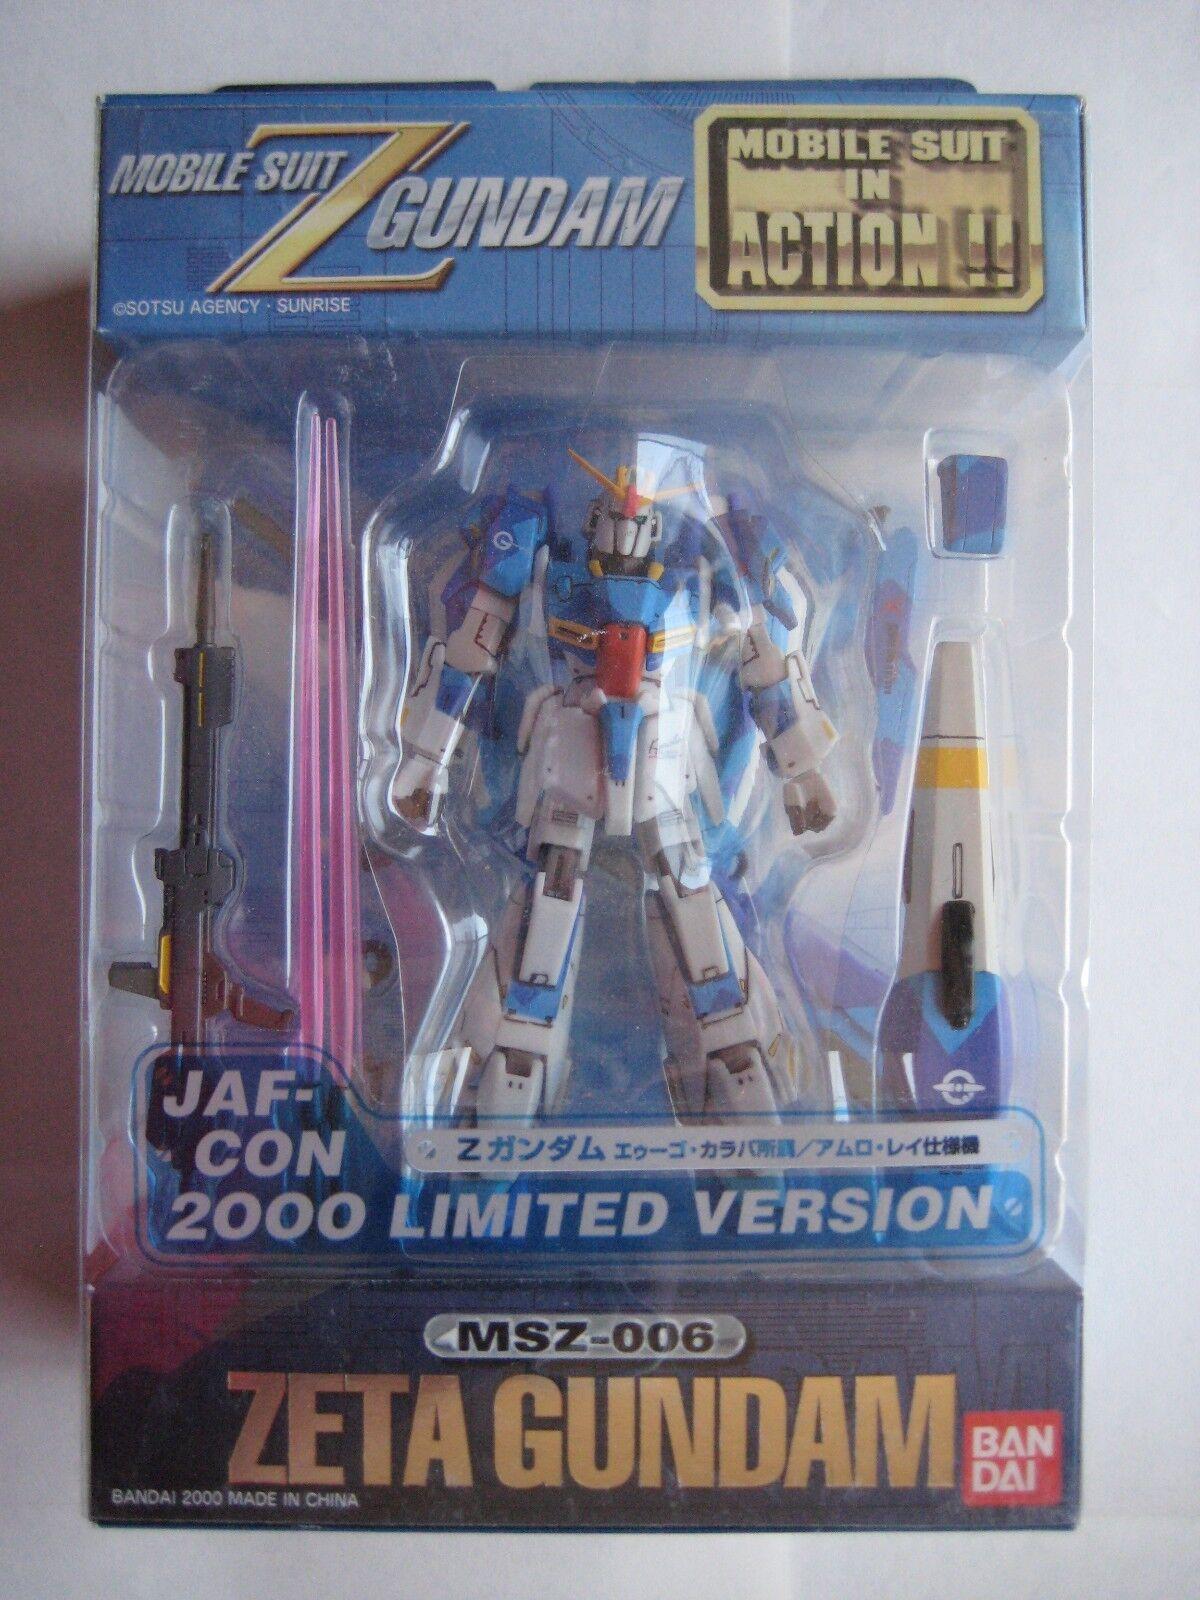 MSIA Gundam Zeta Karaba Jaf Con Farbe Limited Edition